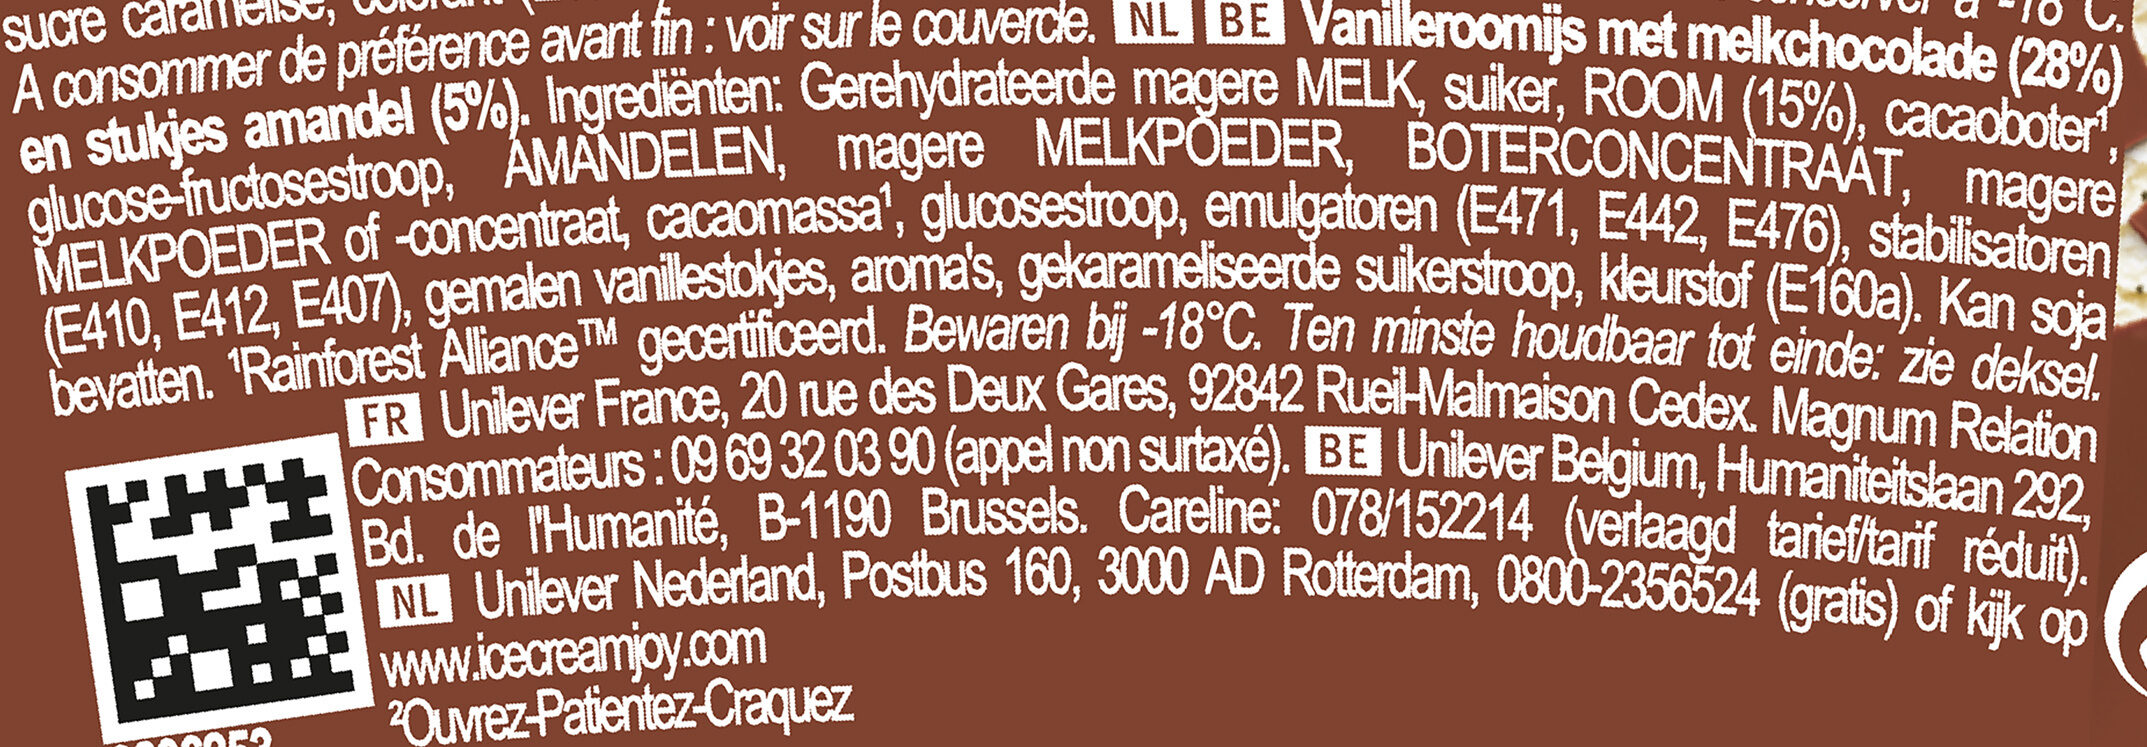 Magnum Glace Pot Vanille Amande - Ingrediënten - nl